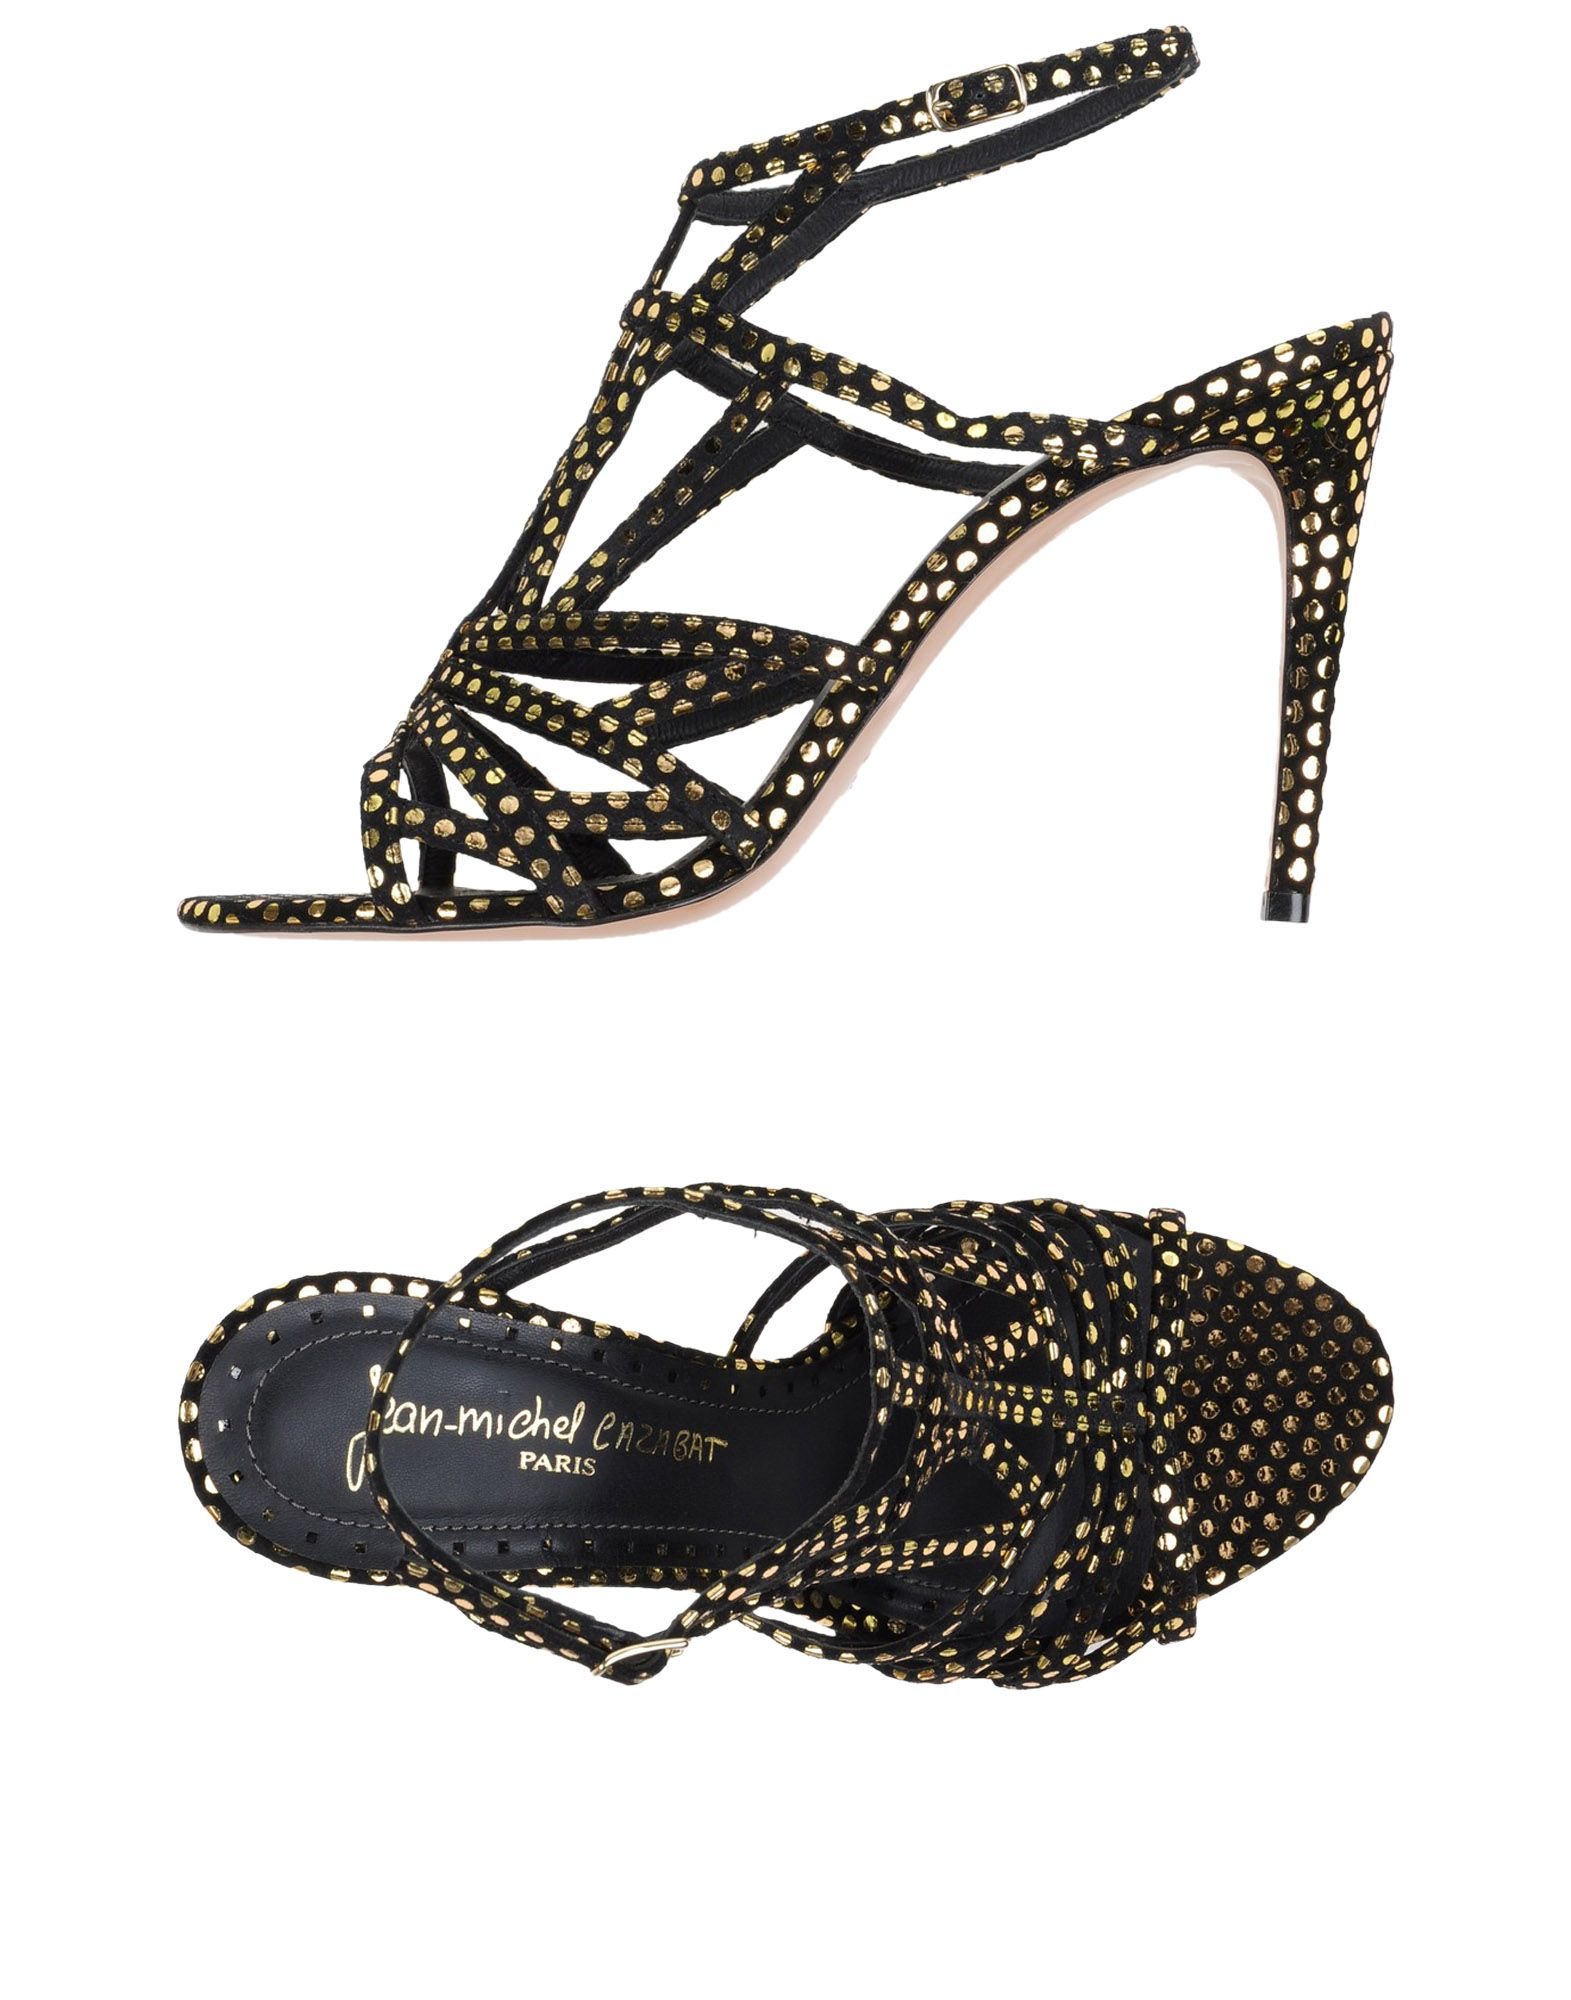 JEAN-MICHEL CAZABAT Sandals in Black